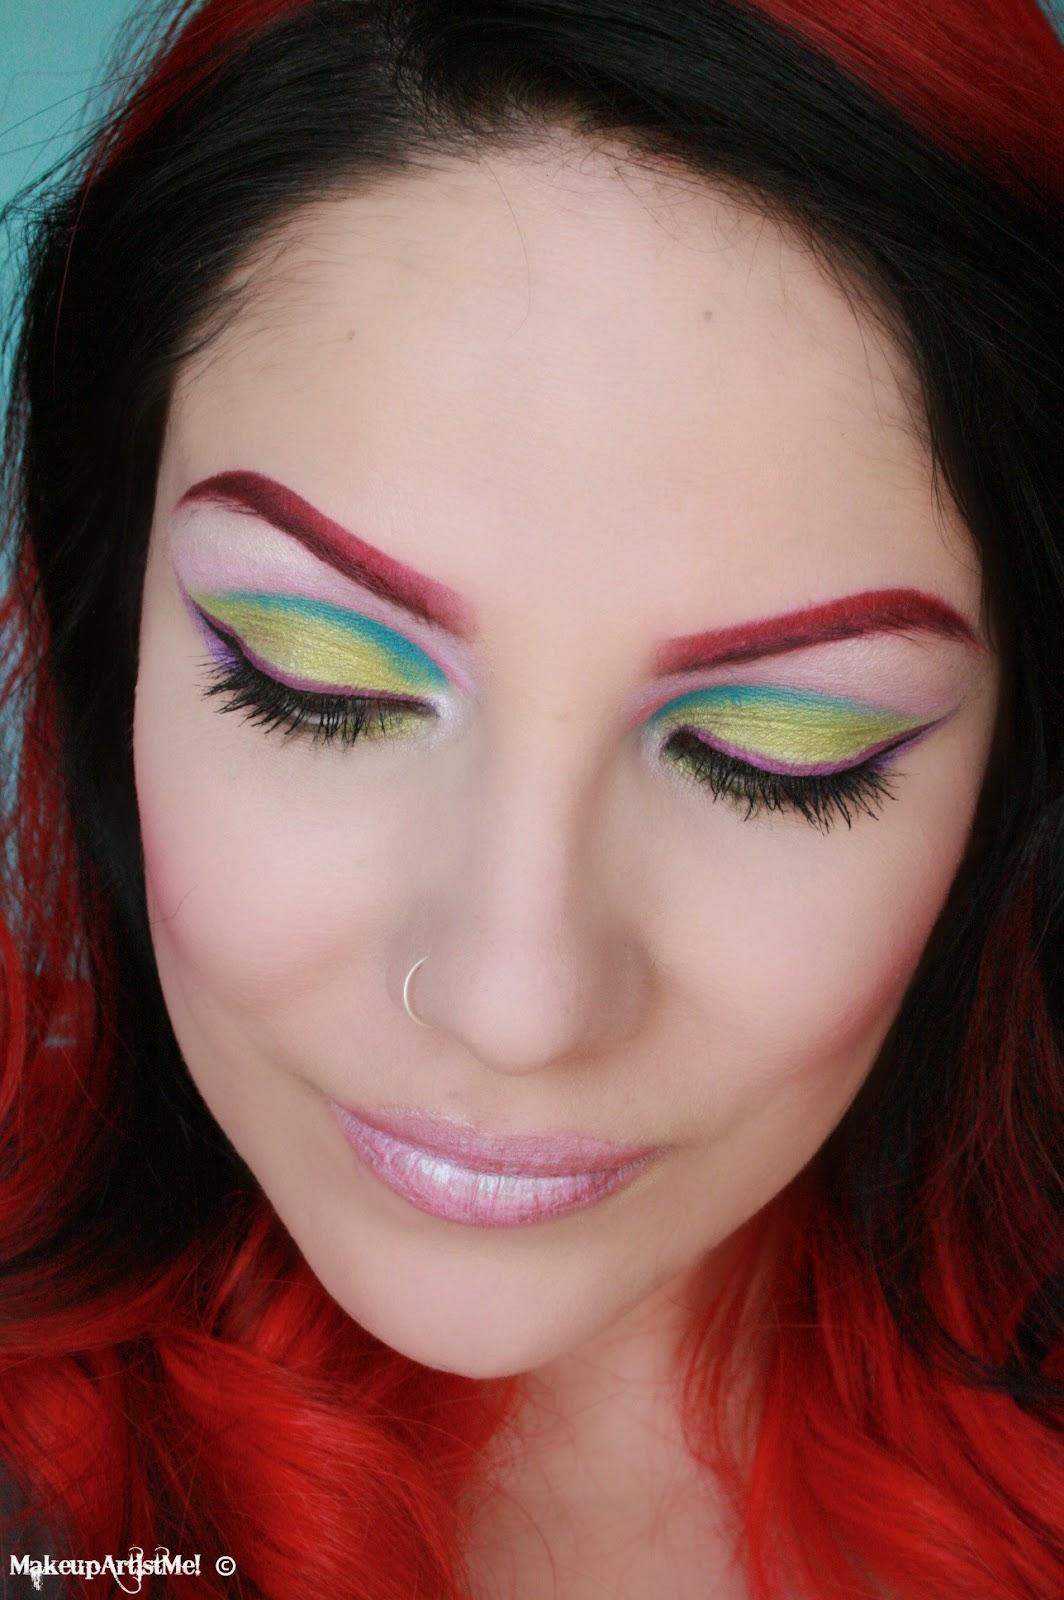 Makeup Artist Youtube: Make-up Artist Me!: Spring Rainbow